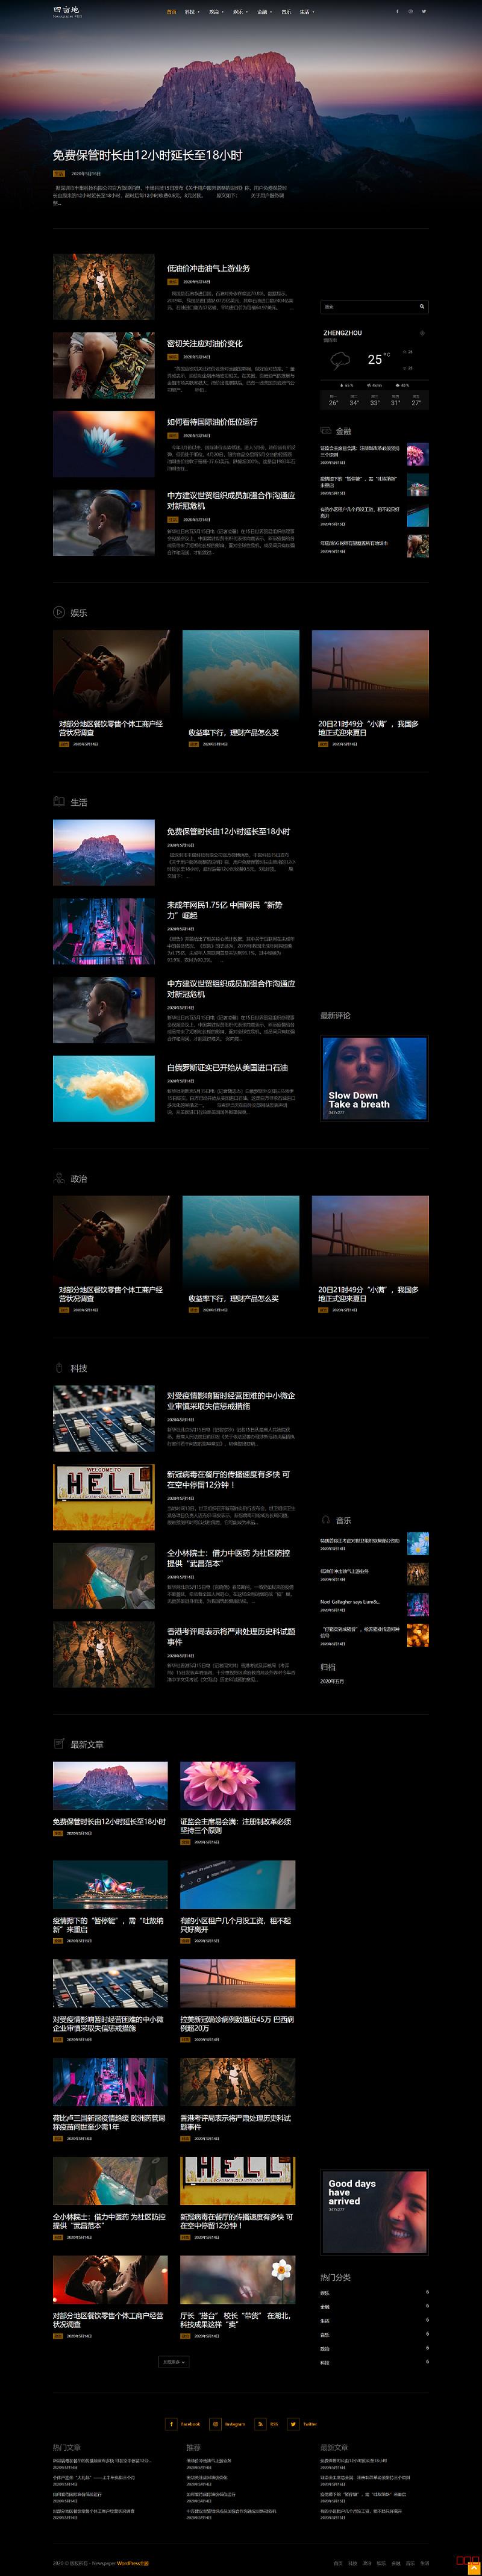 【WP主题】新闻杂志Newspaper中文版V10.3.6.1版WordPress主题带子主题-爱资源分享